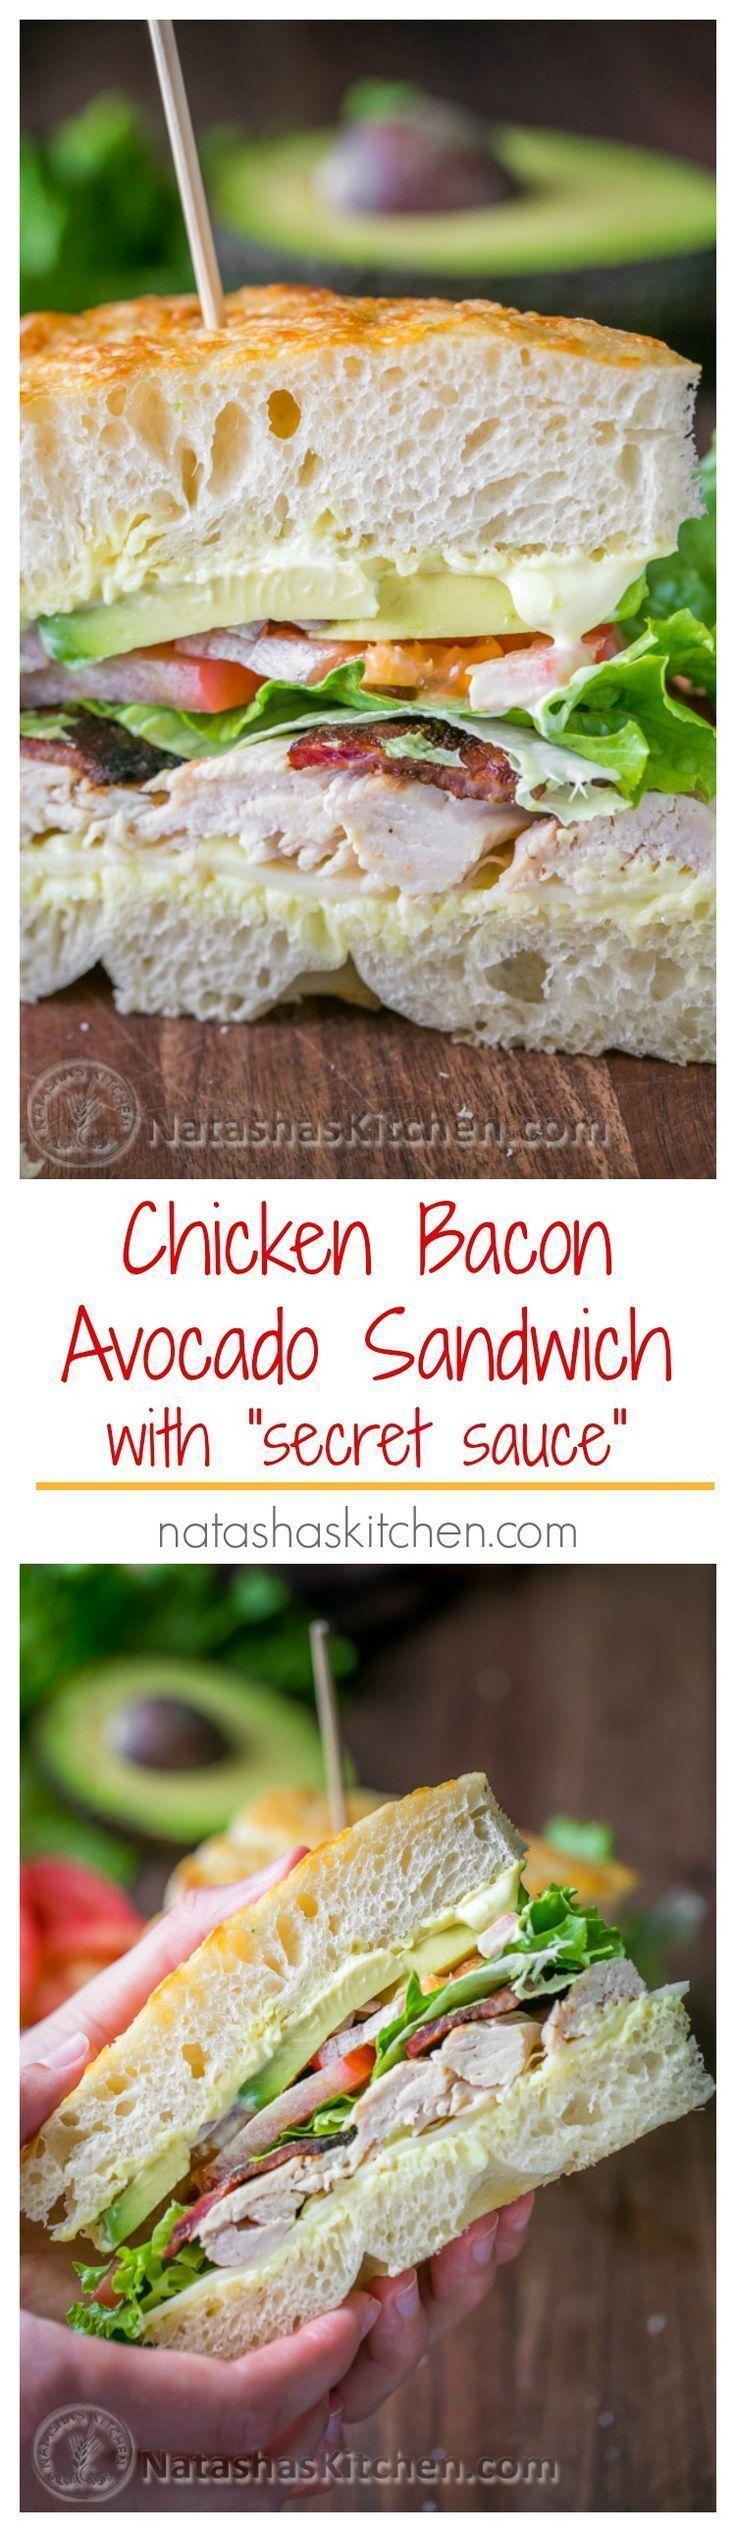 "Chicken Bacon Avocado Sandwich with ""secret sauce"" - A Kneaders Bakery Copycat Recipe   NatashasKitchen.com"